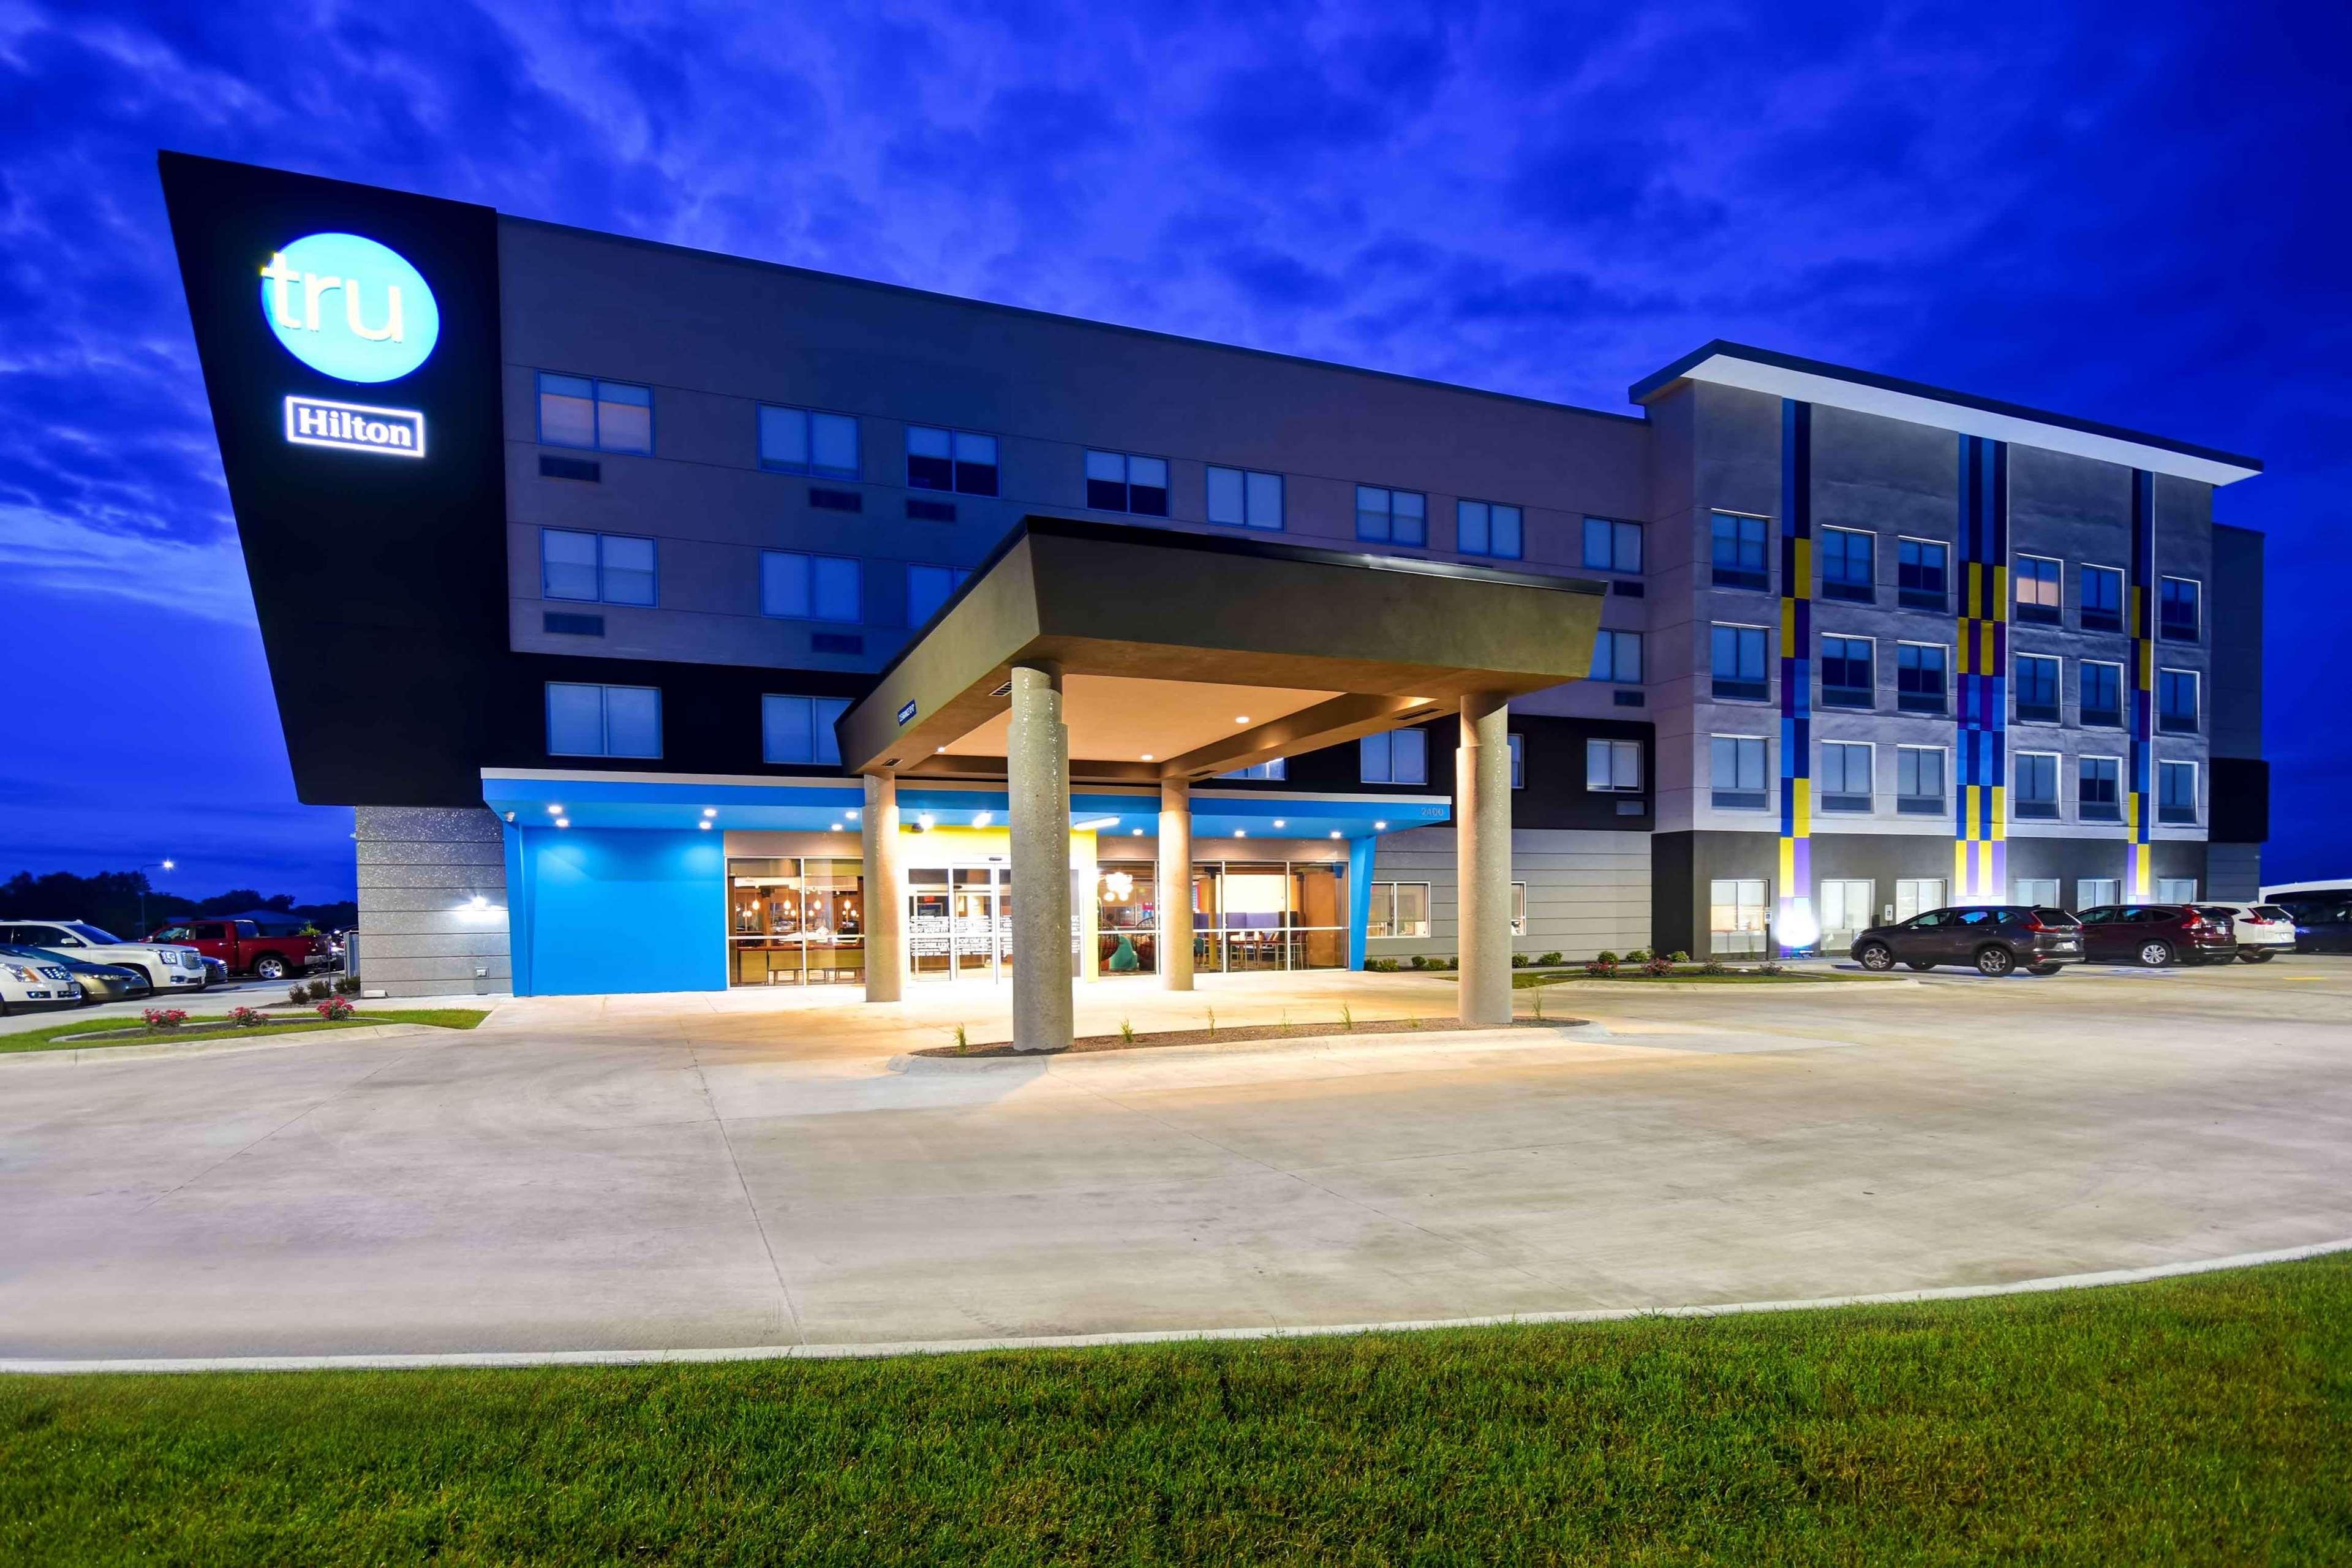 Tru by Hilton North Platte image 17